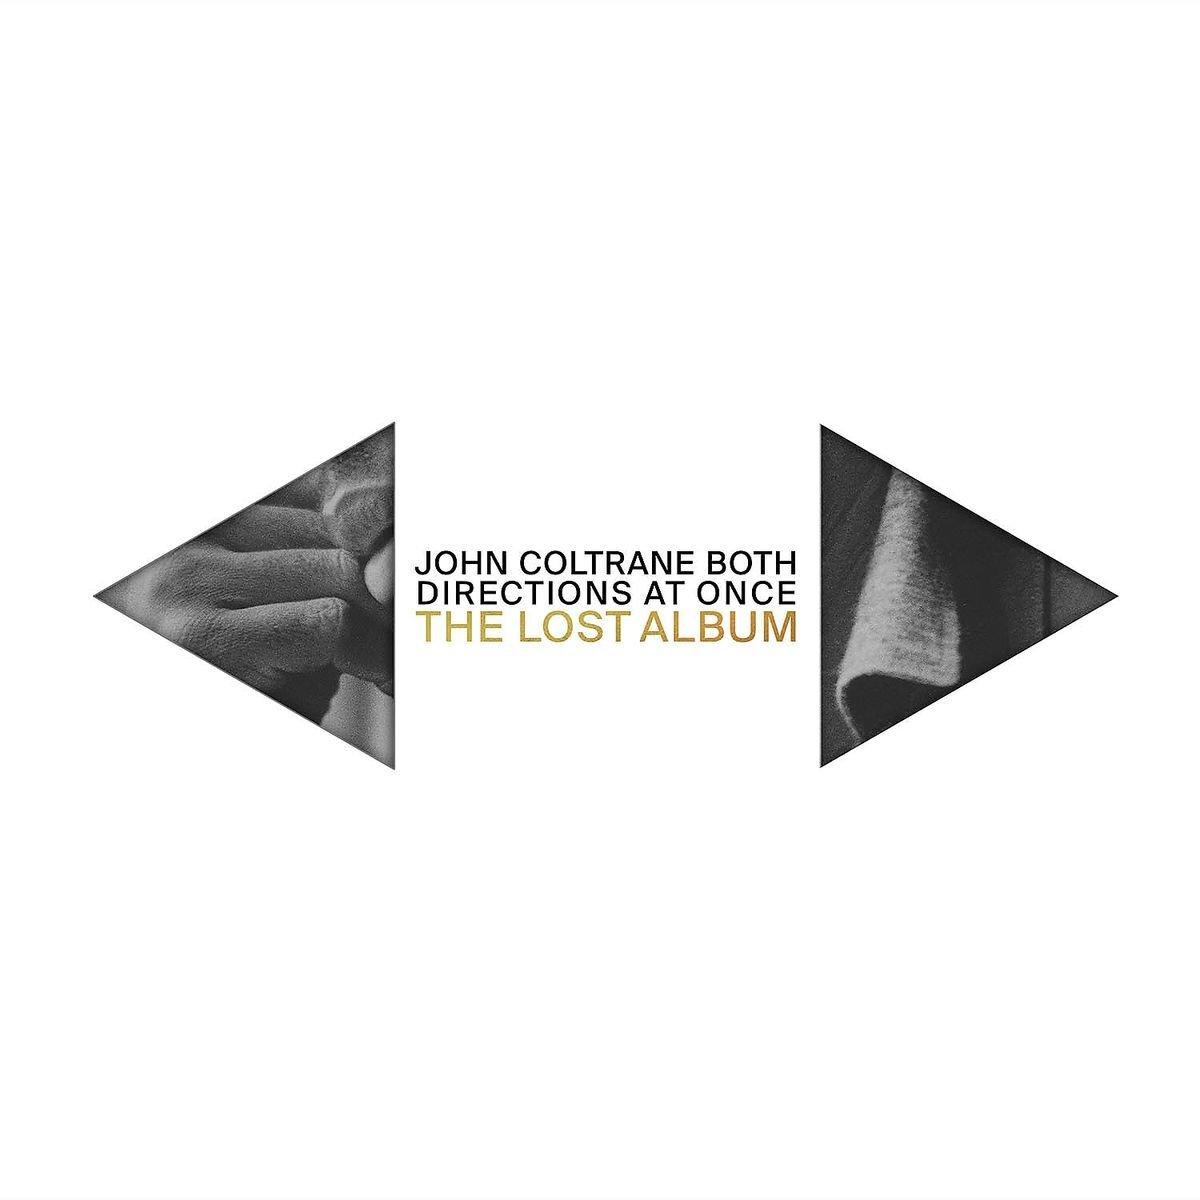 Copertina Vinile 33 giri Both Directions At Once: The Lost Album [2 LP] di John Coltrane